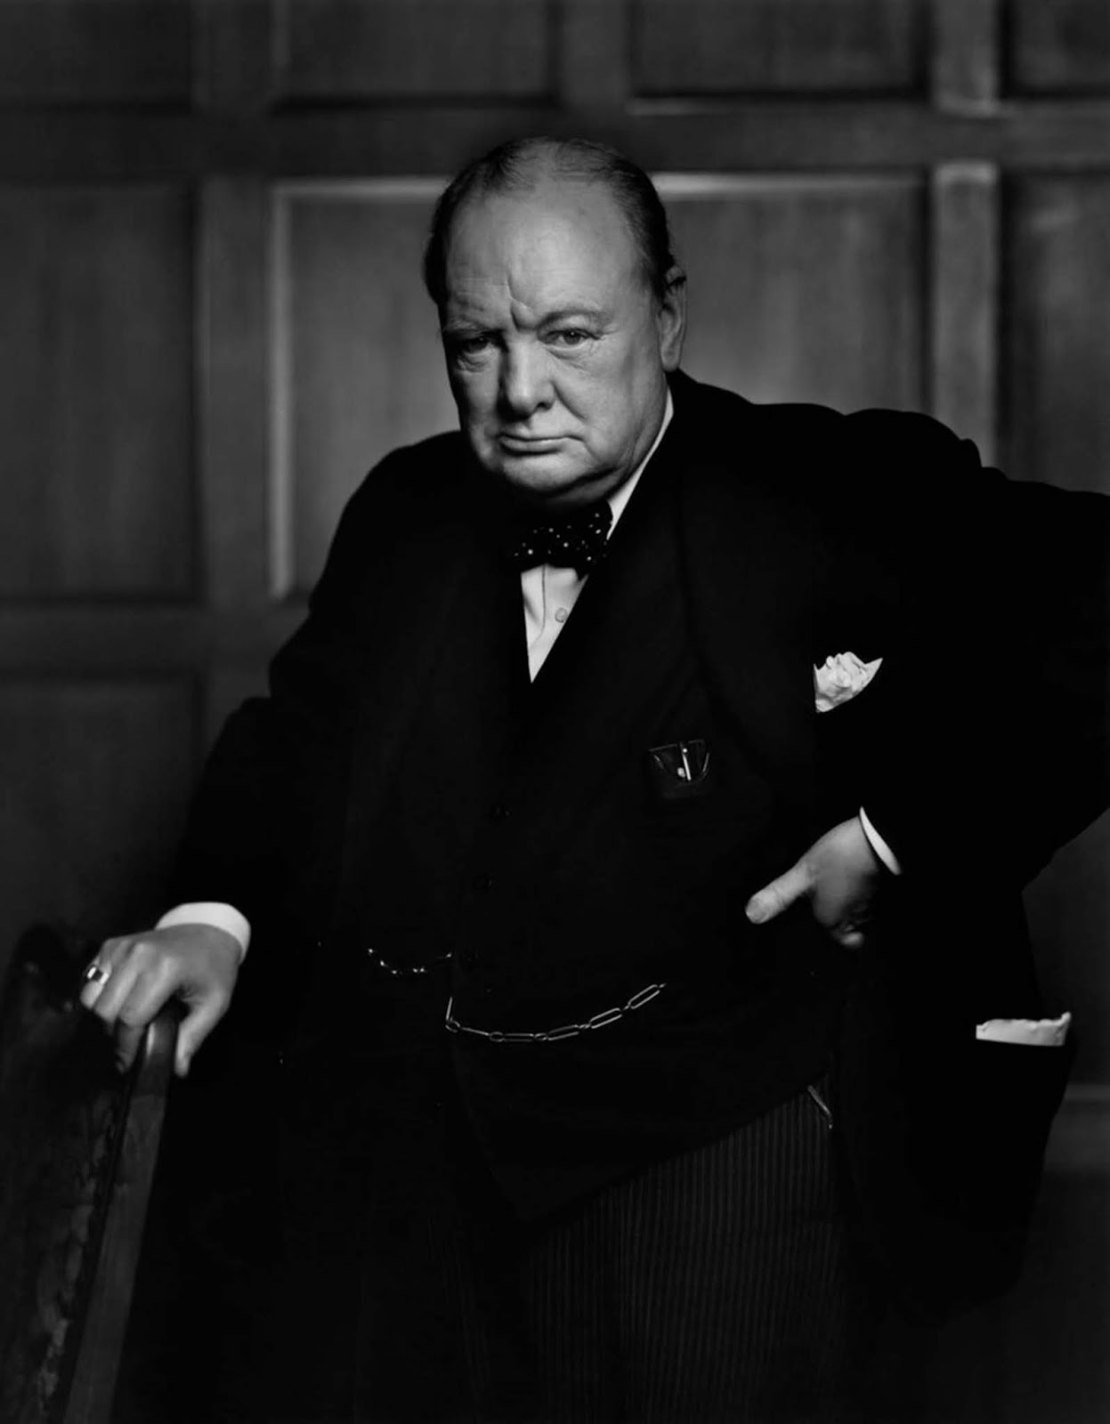 history photo Winston Churchill, Yousuf Karsh, 1941